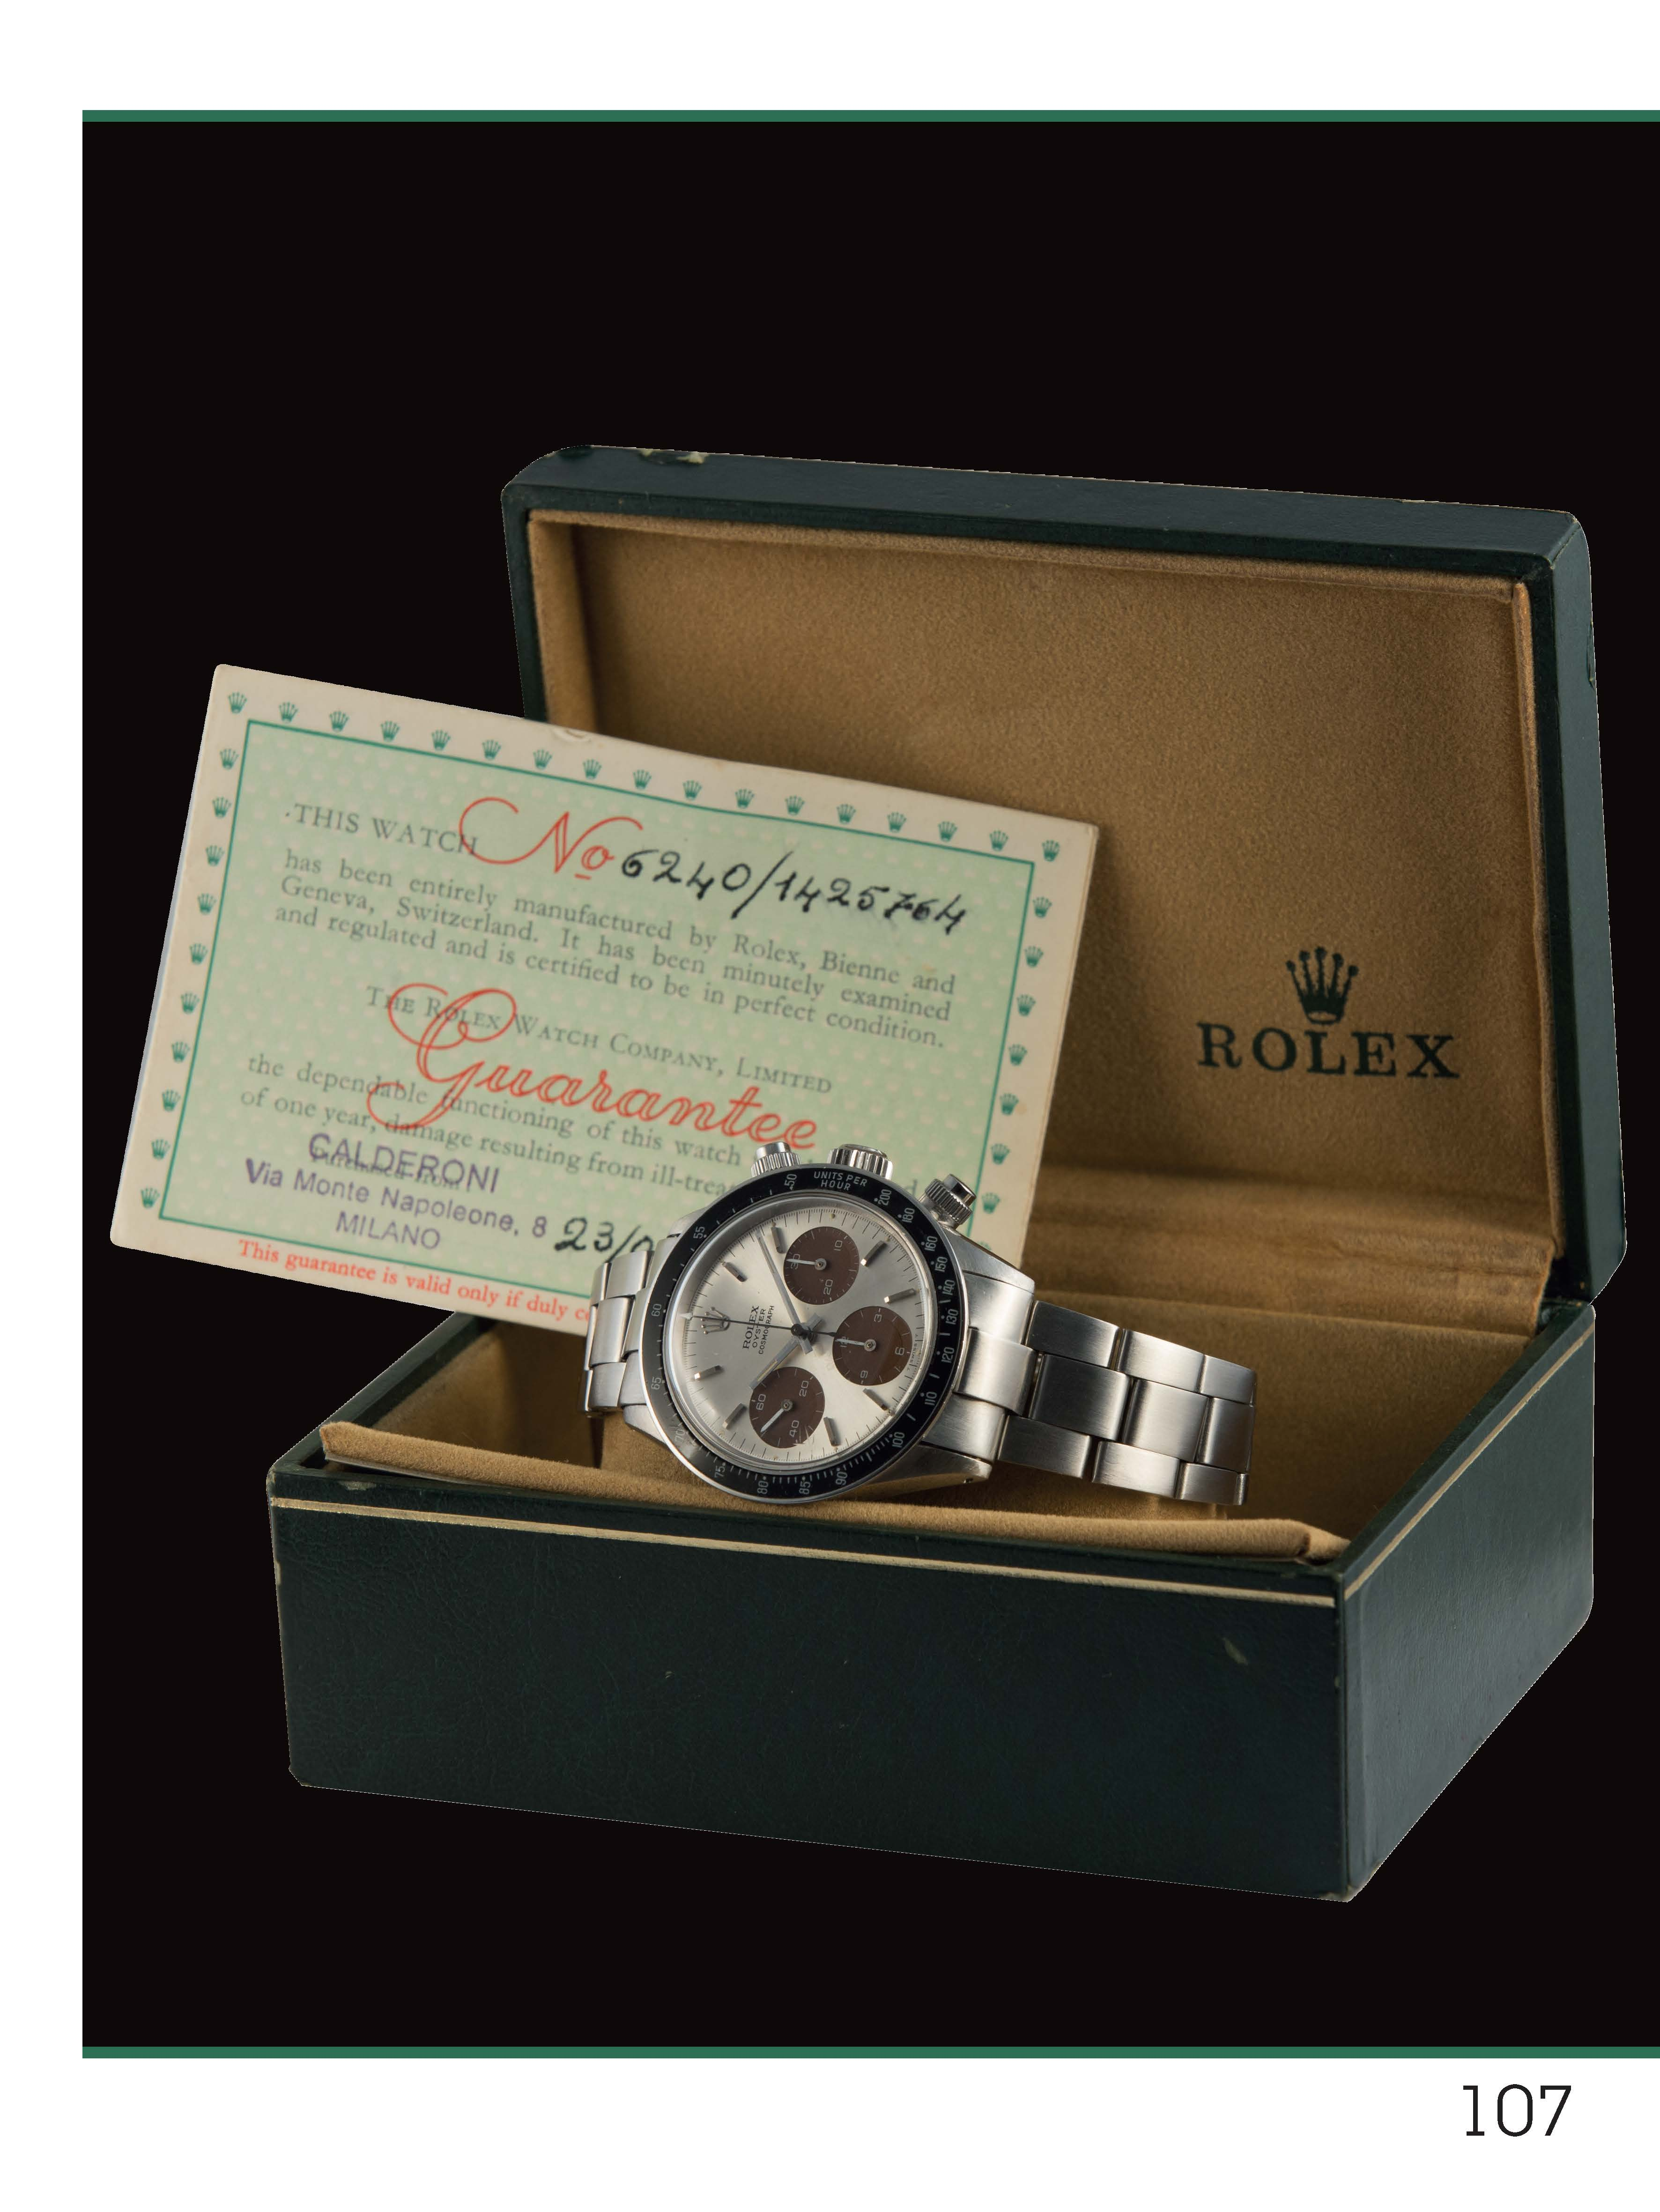 Rolex Daytona manual winding